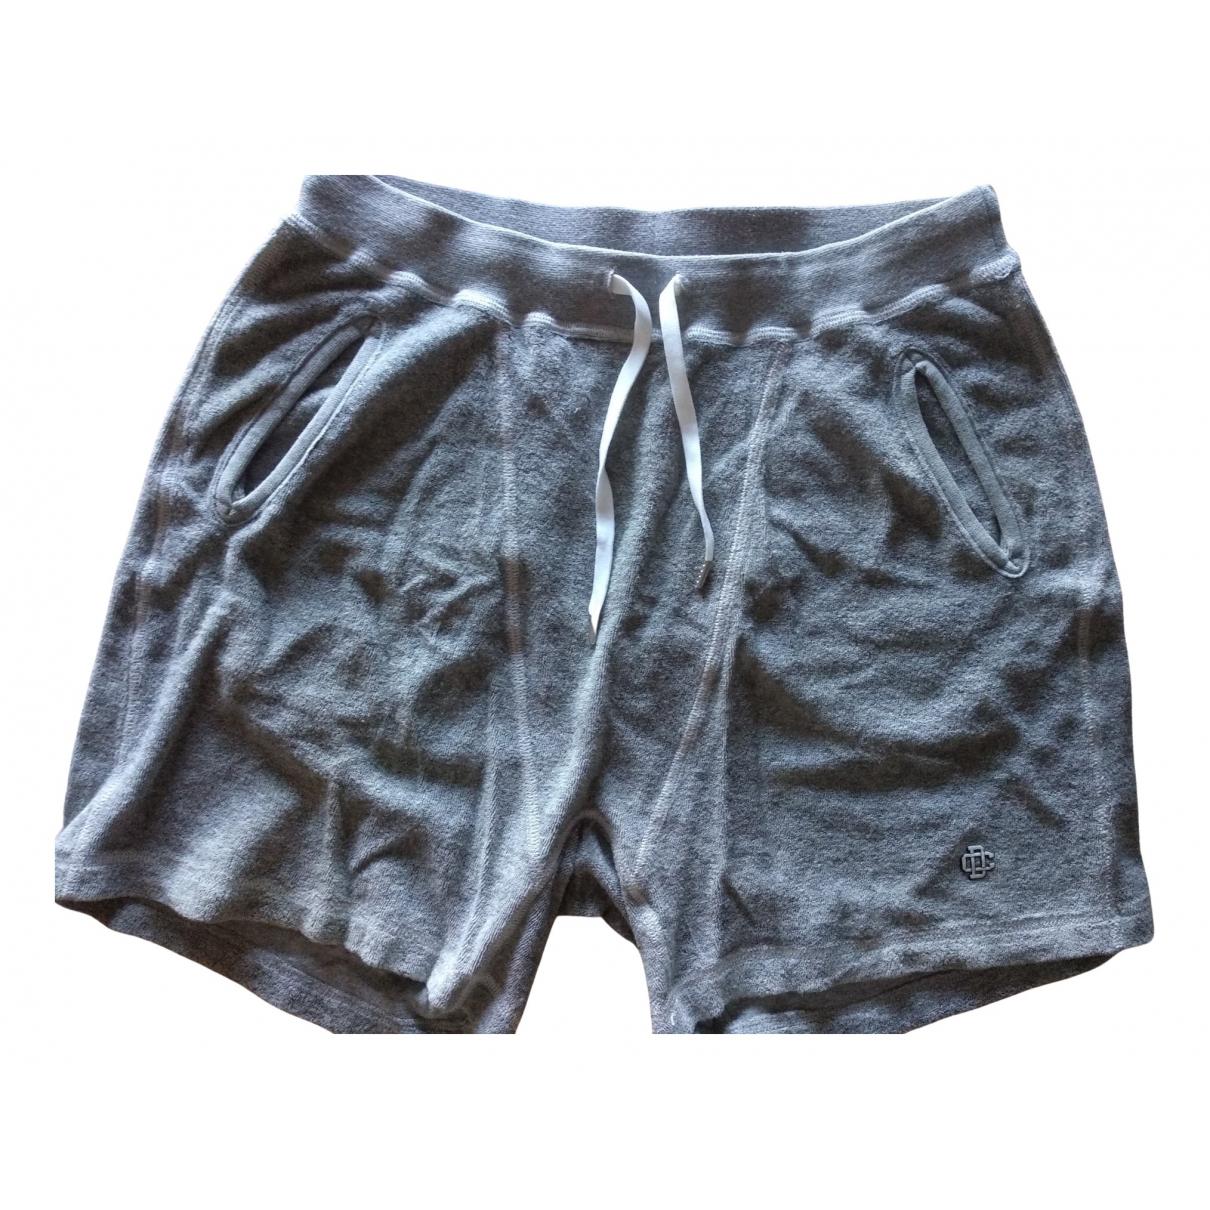 Dsquared2 \N Shorts in  Grau Baumwolle